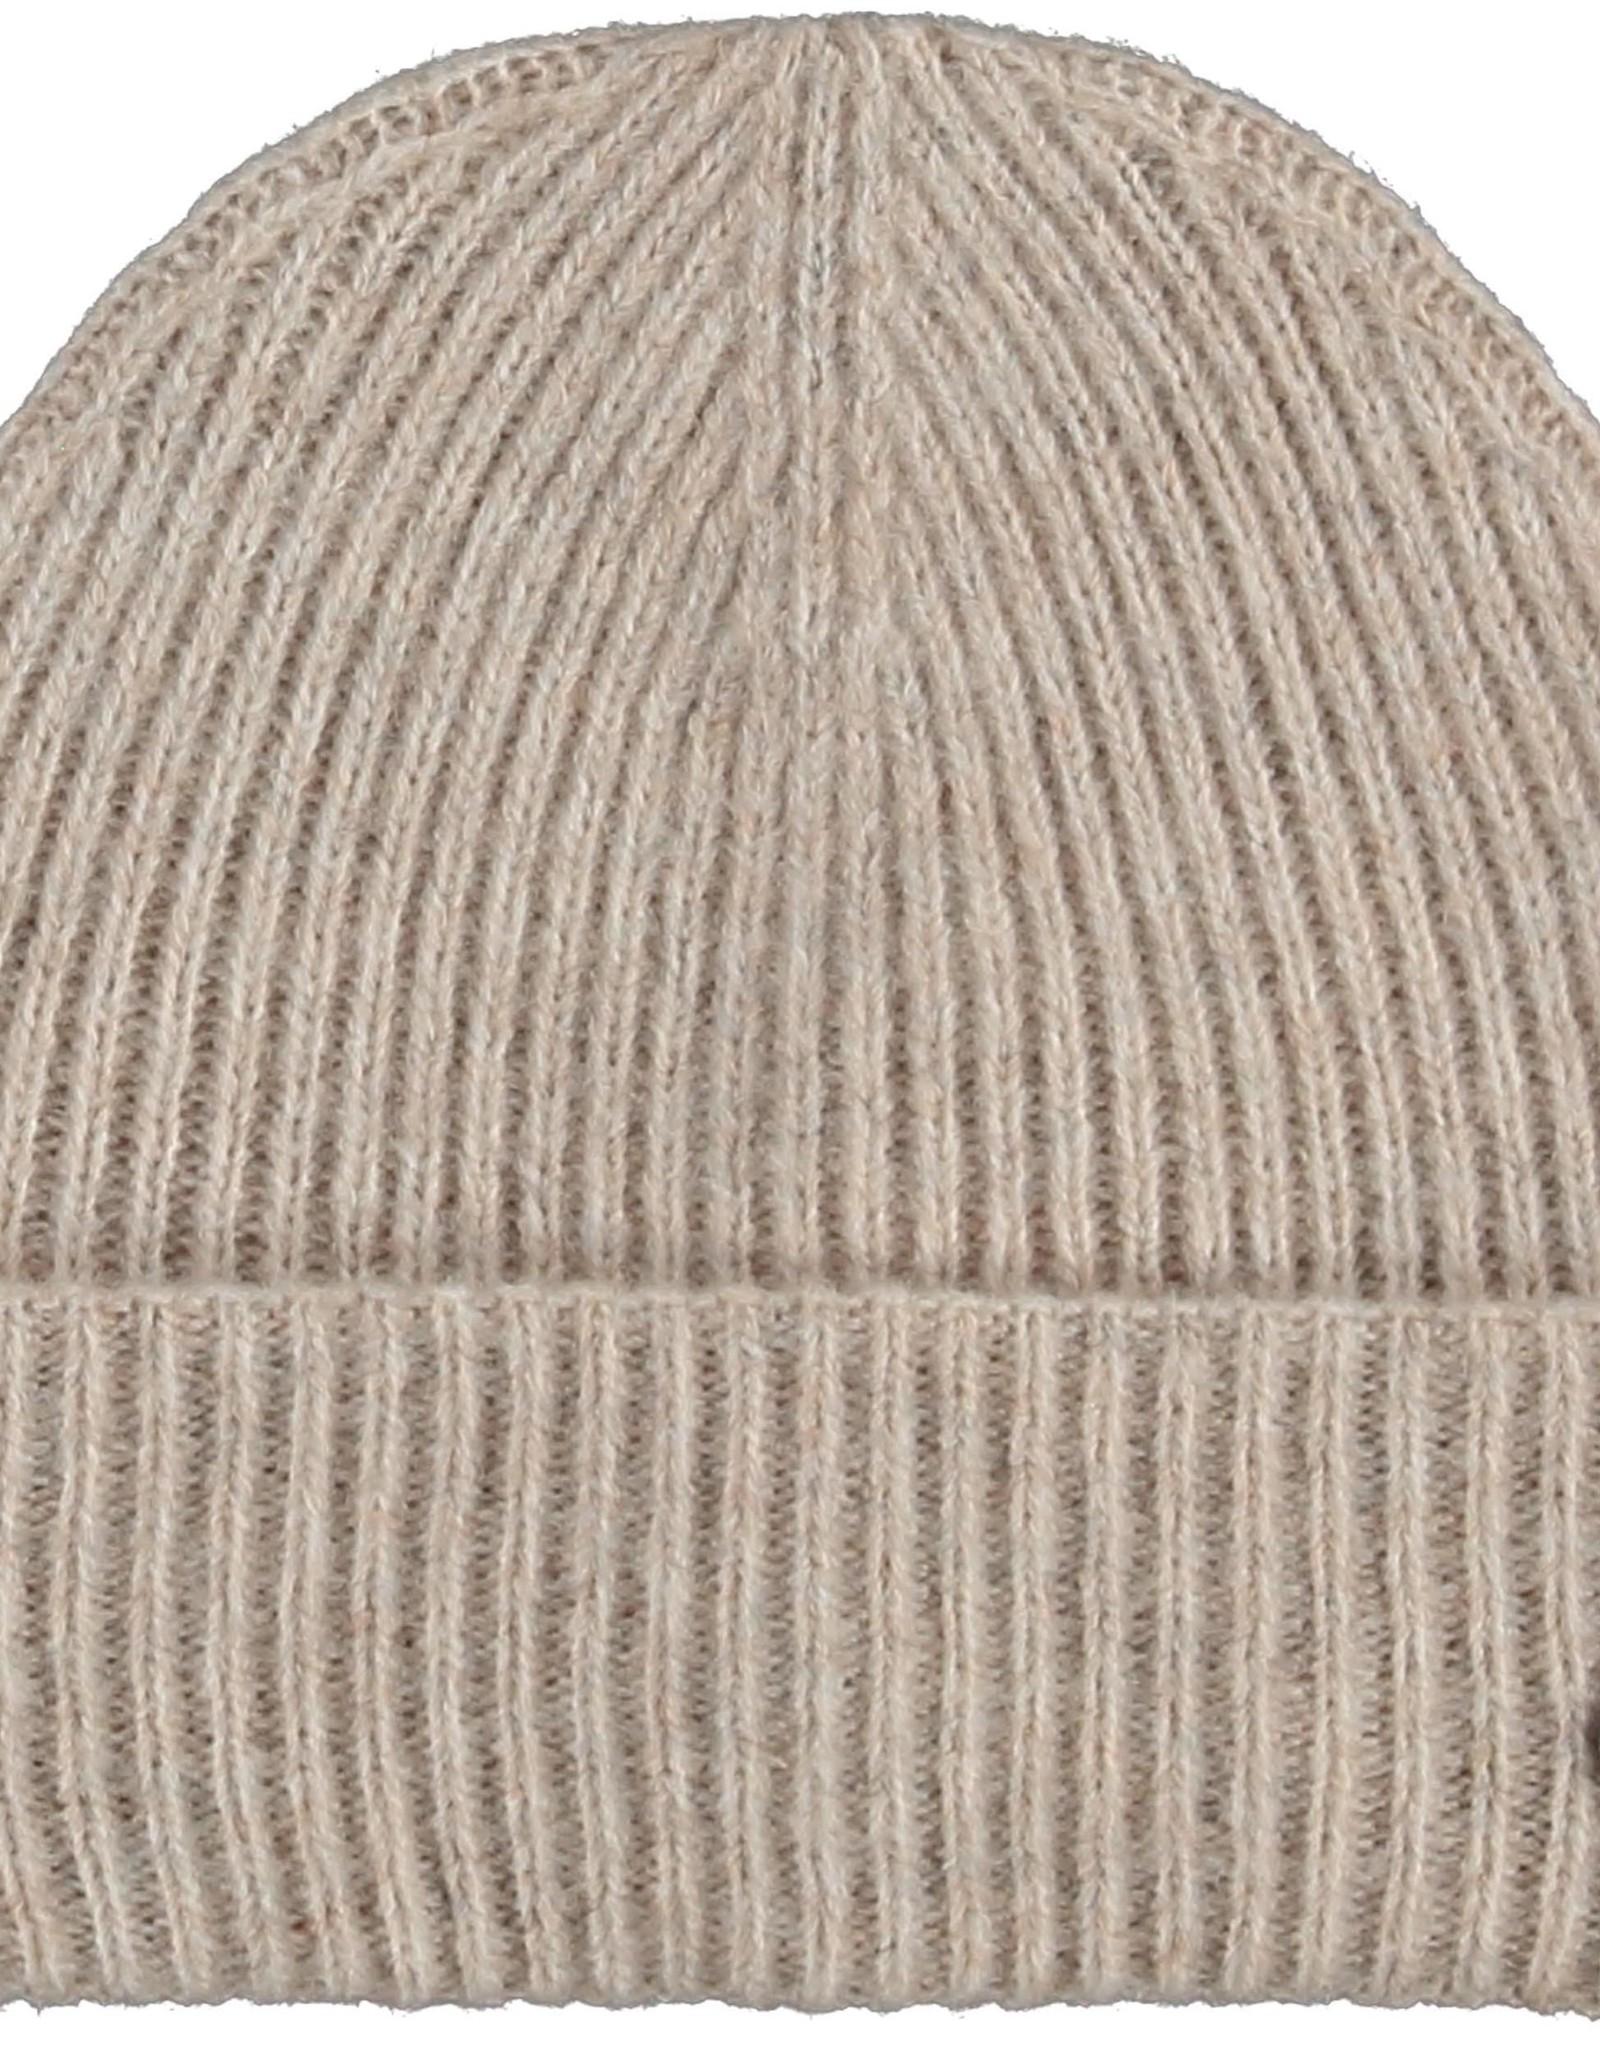 FRAAS Pastel Mélange Knit Hat